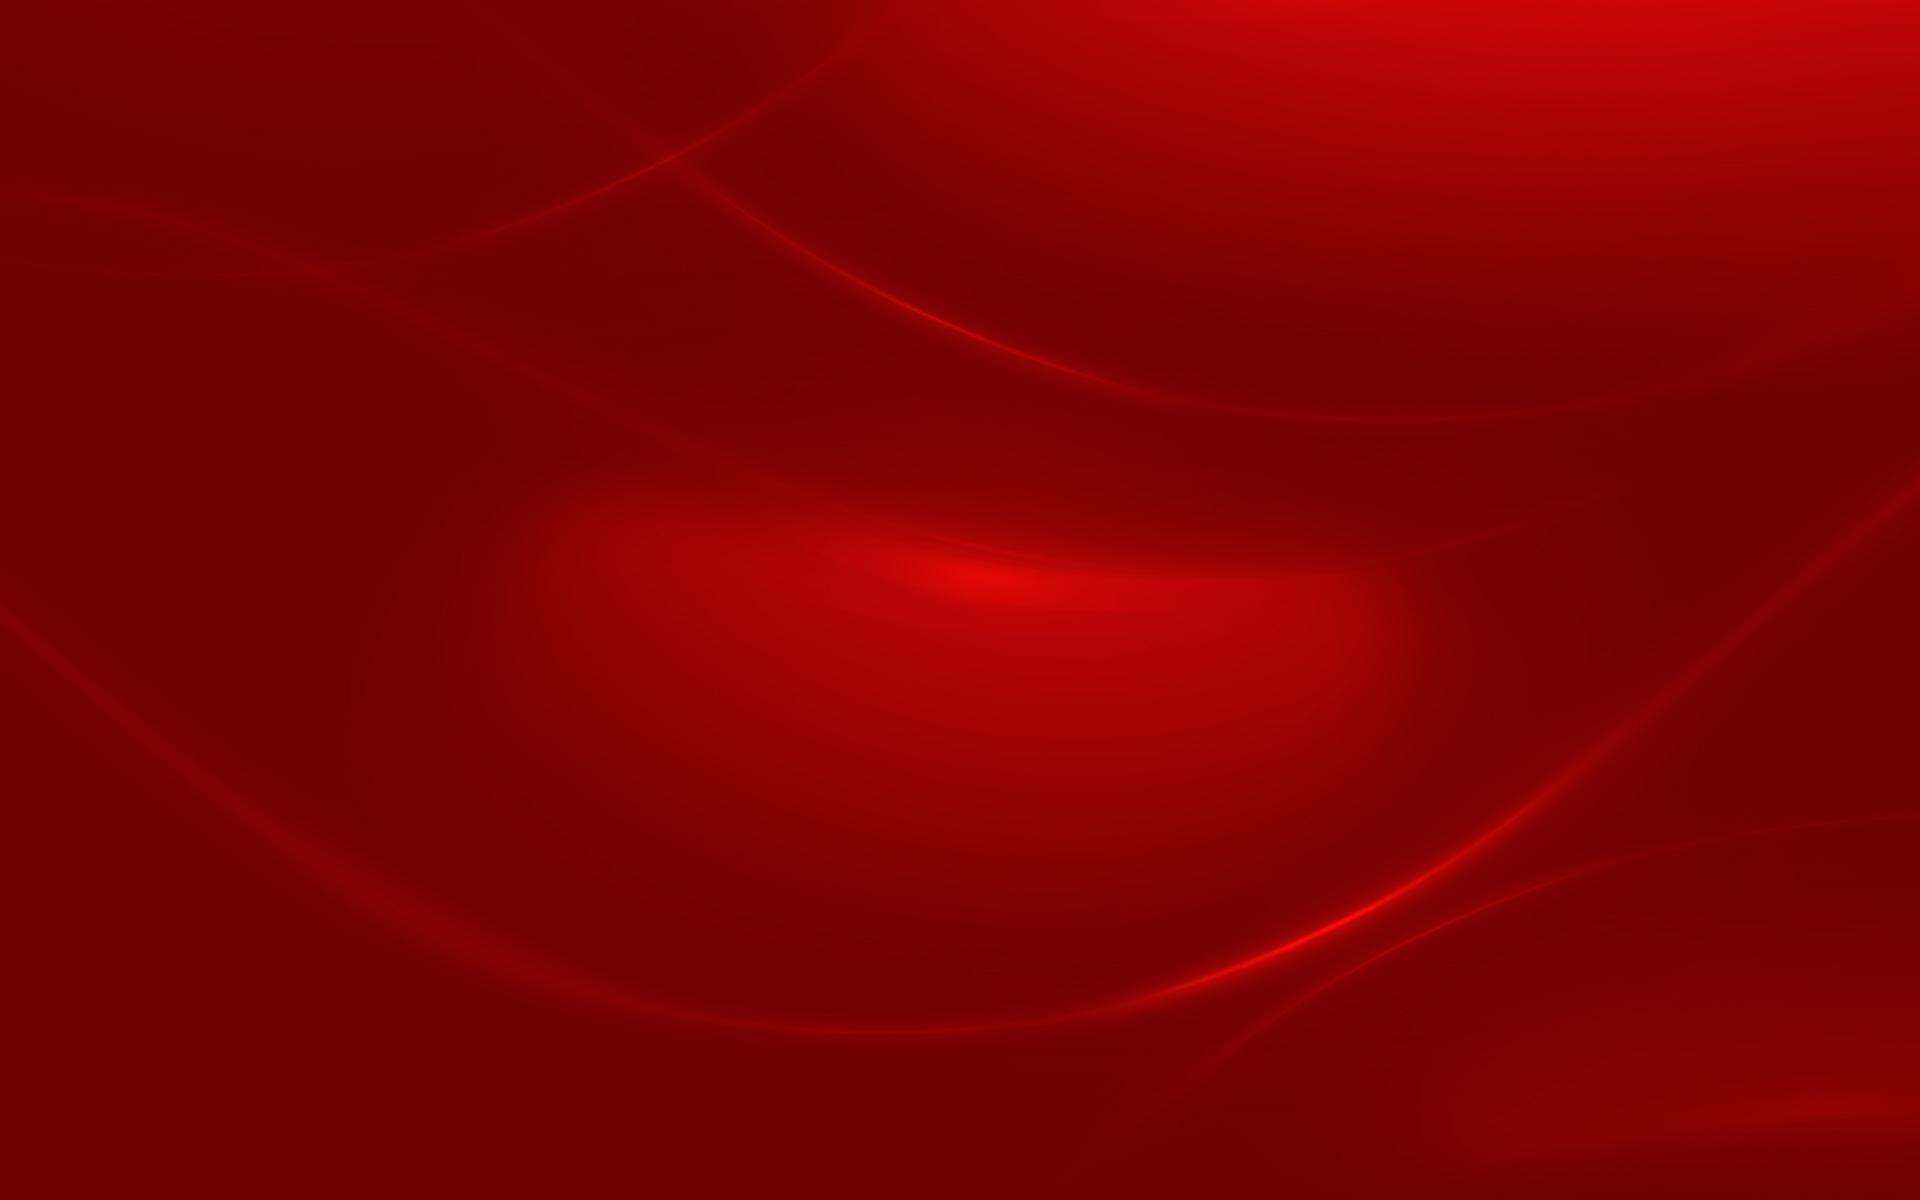 Dell Desktop Backgrounds Wallpaper 1920x1200 1920x1200